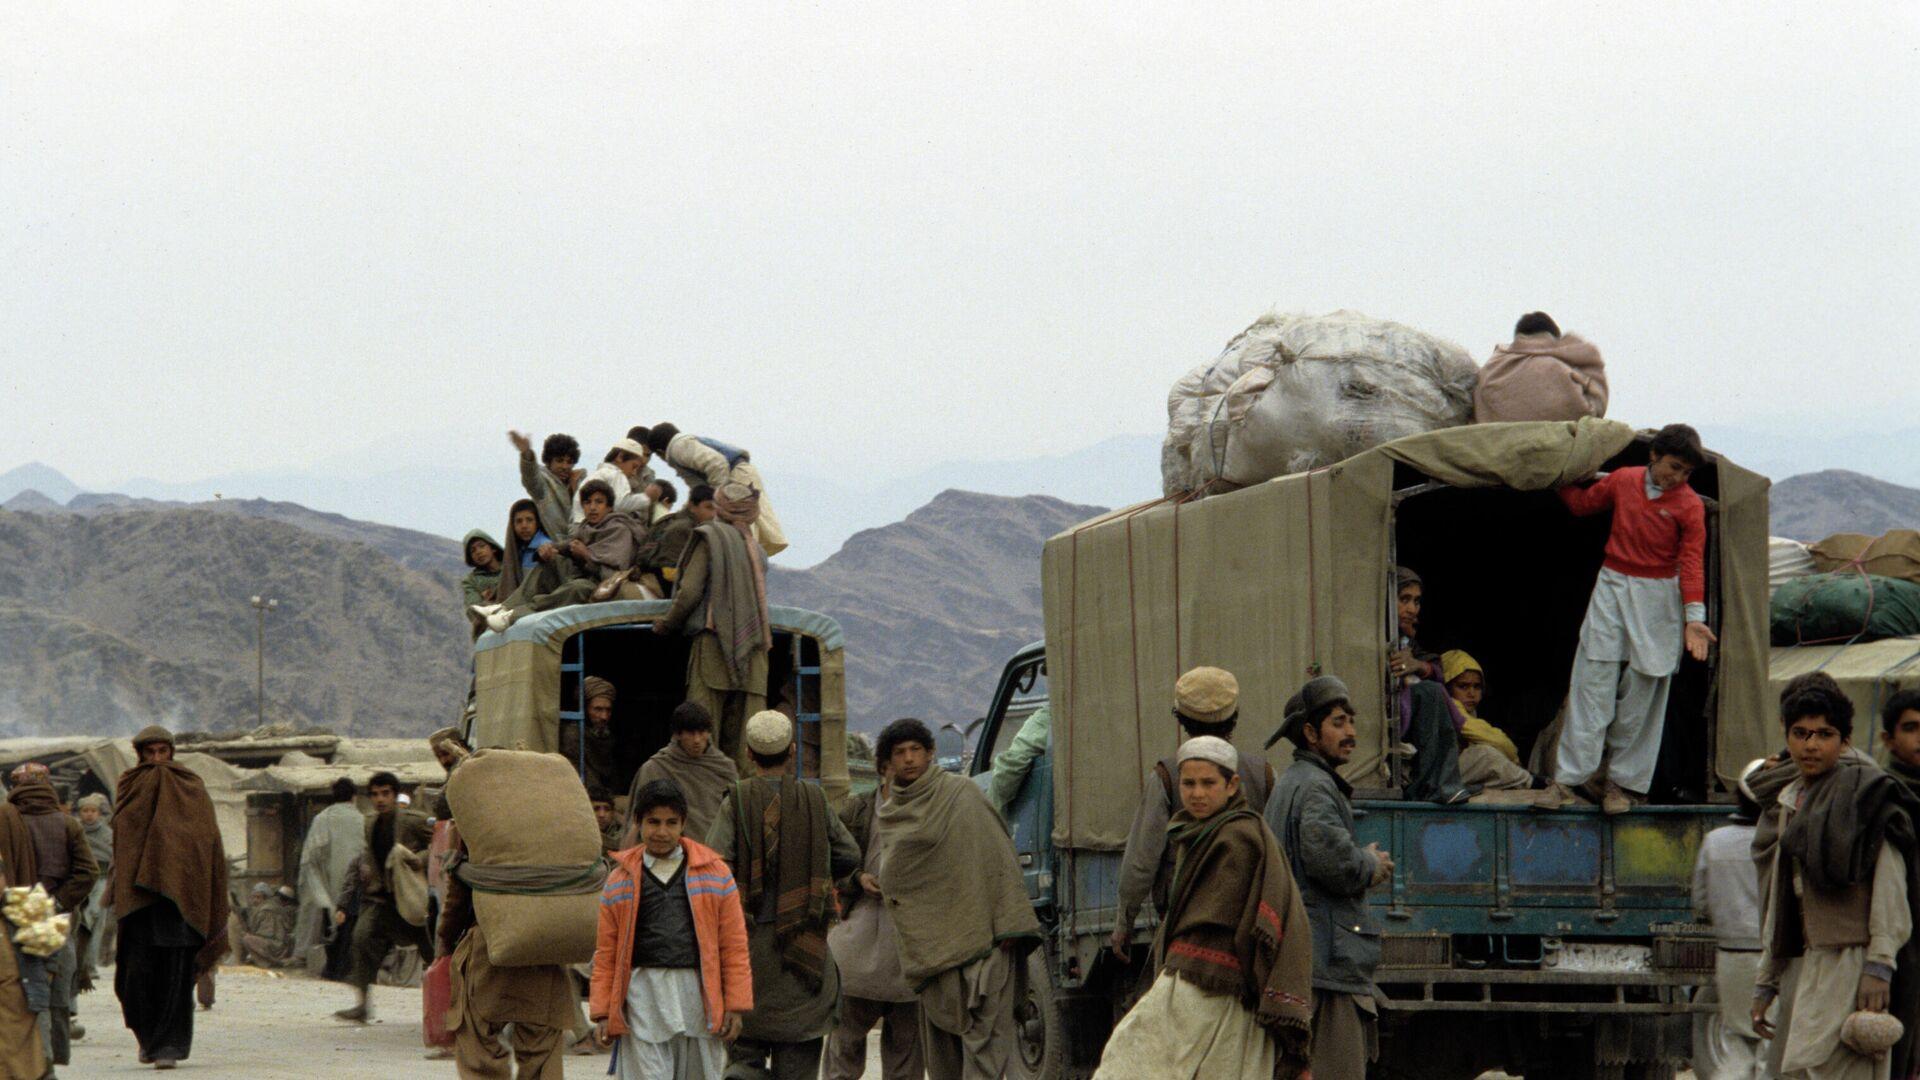 Афганские беженцы - Sputnik Узбекистан, 1920, 22.07.2021